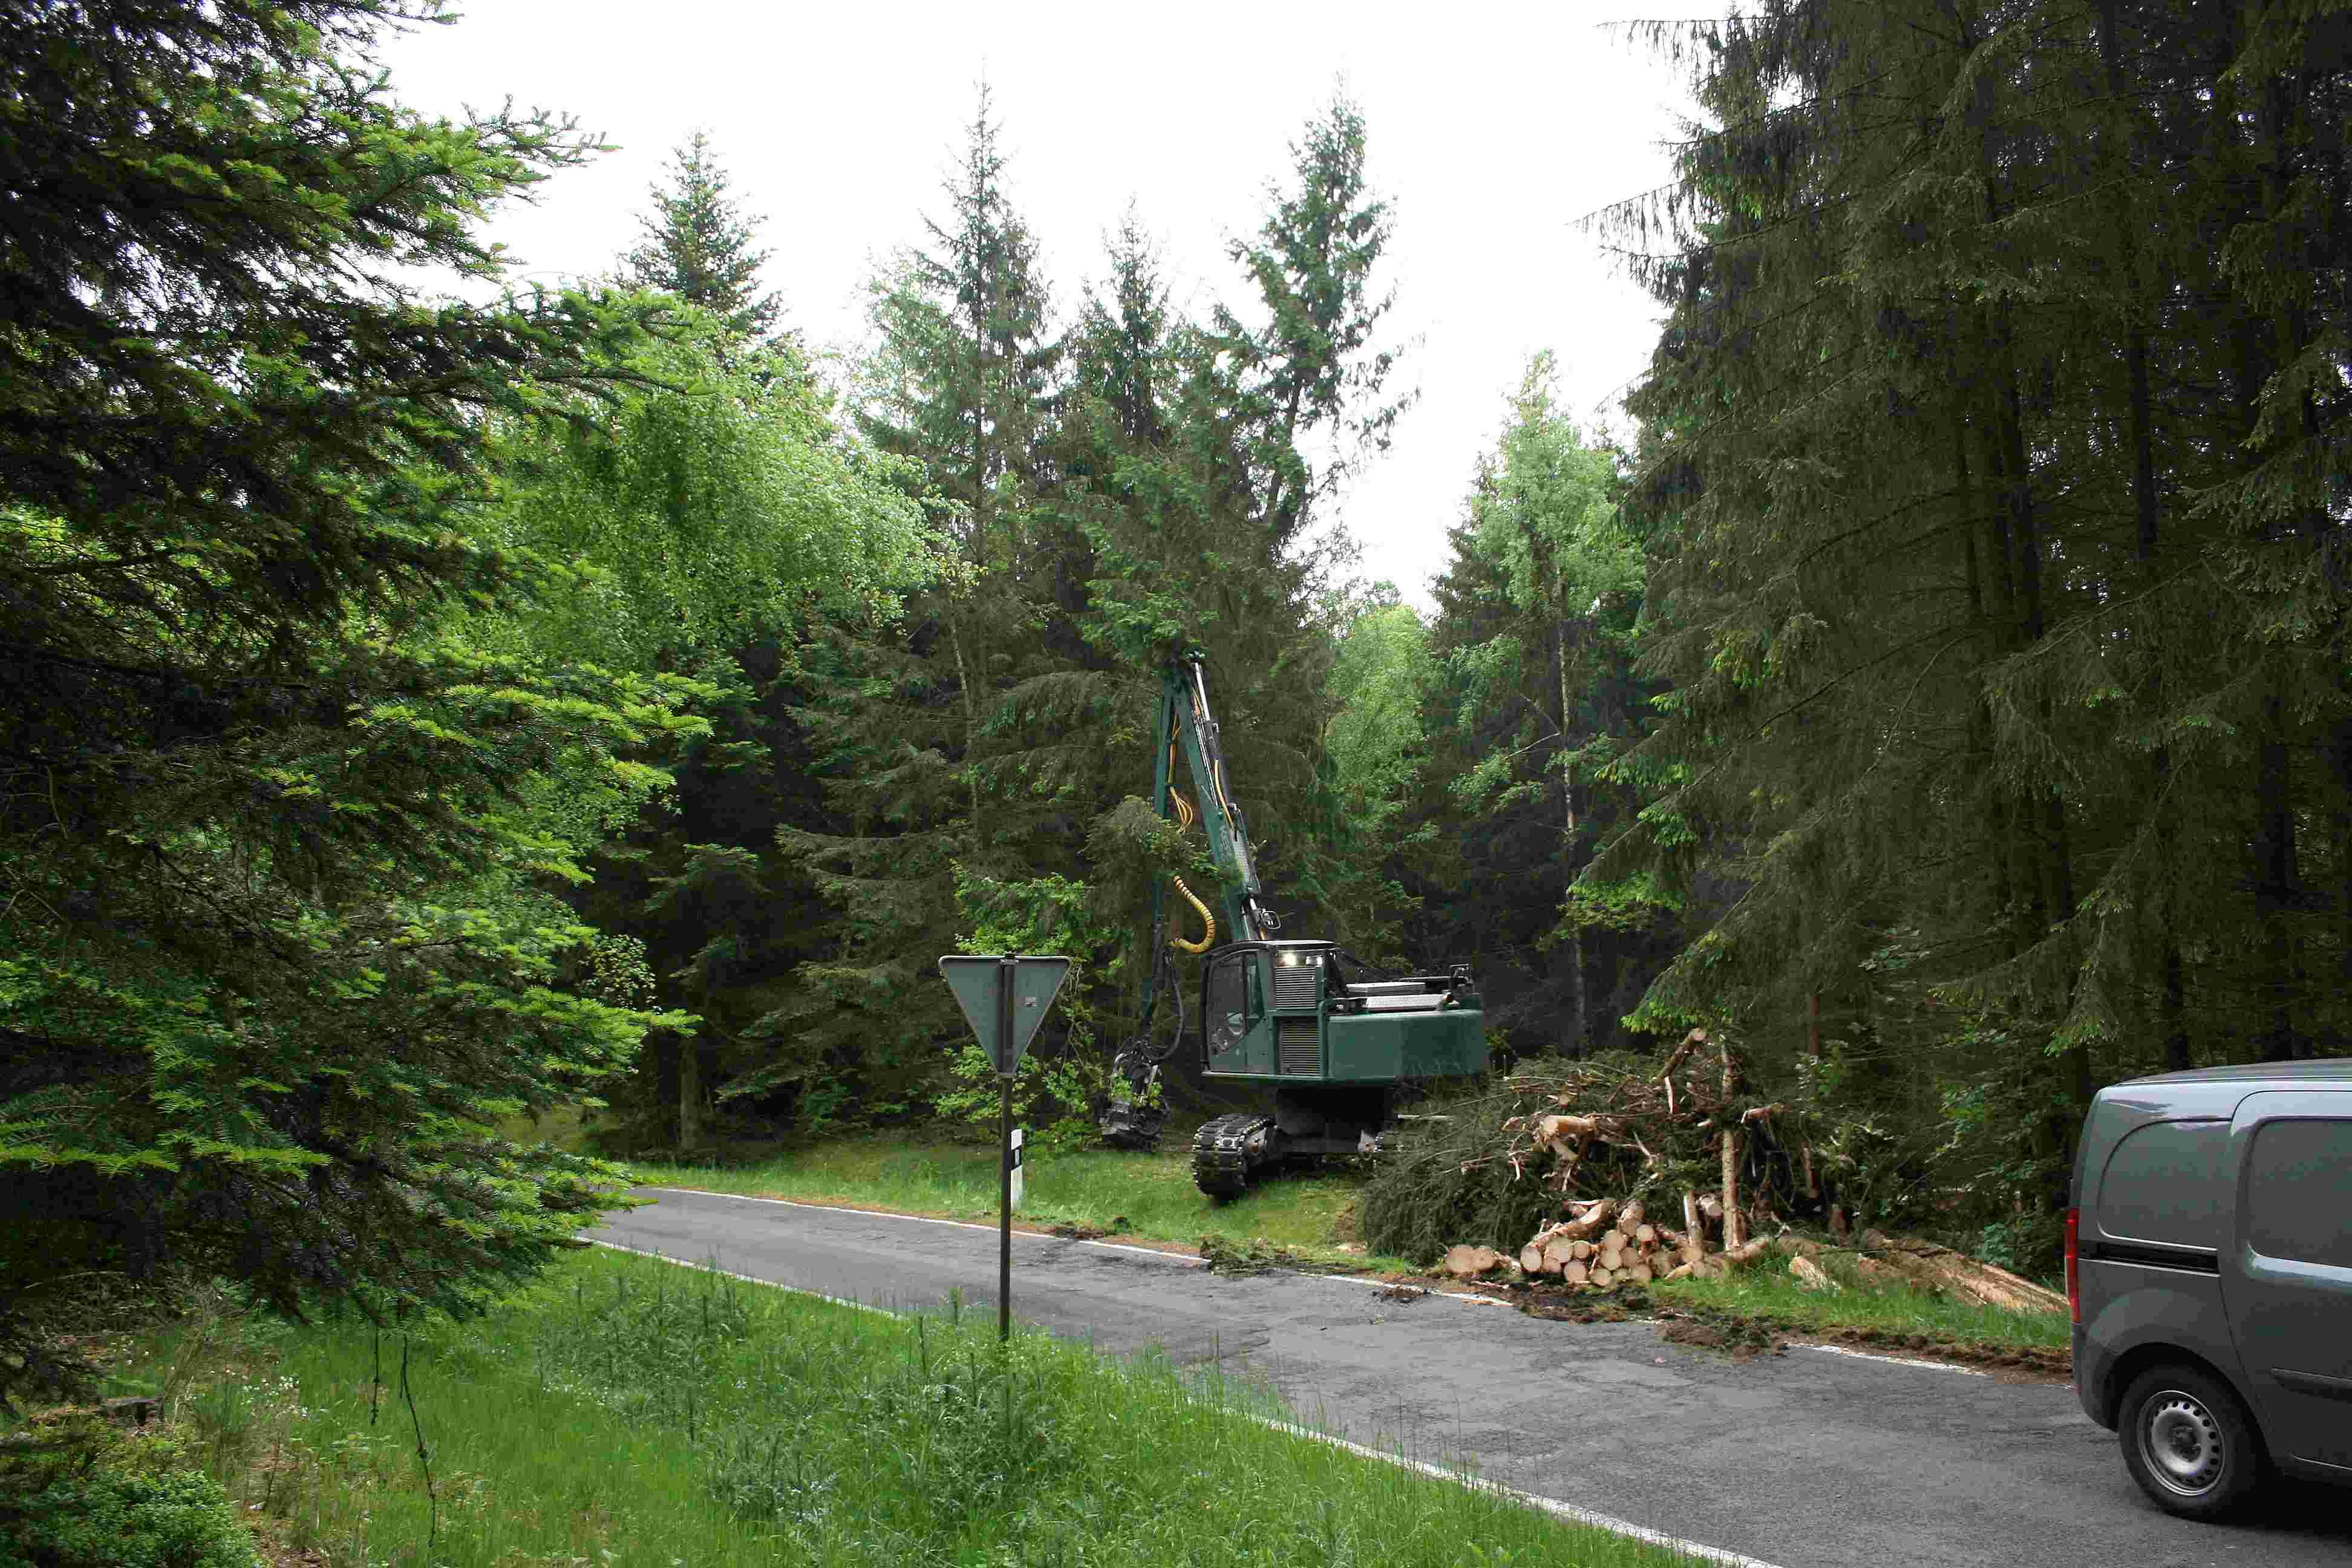 drespitz-hundheimer-abfahrt-24-mai-2016-um-9-uhr-beginn-der-rodungsarbeiten